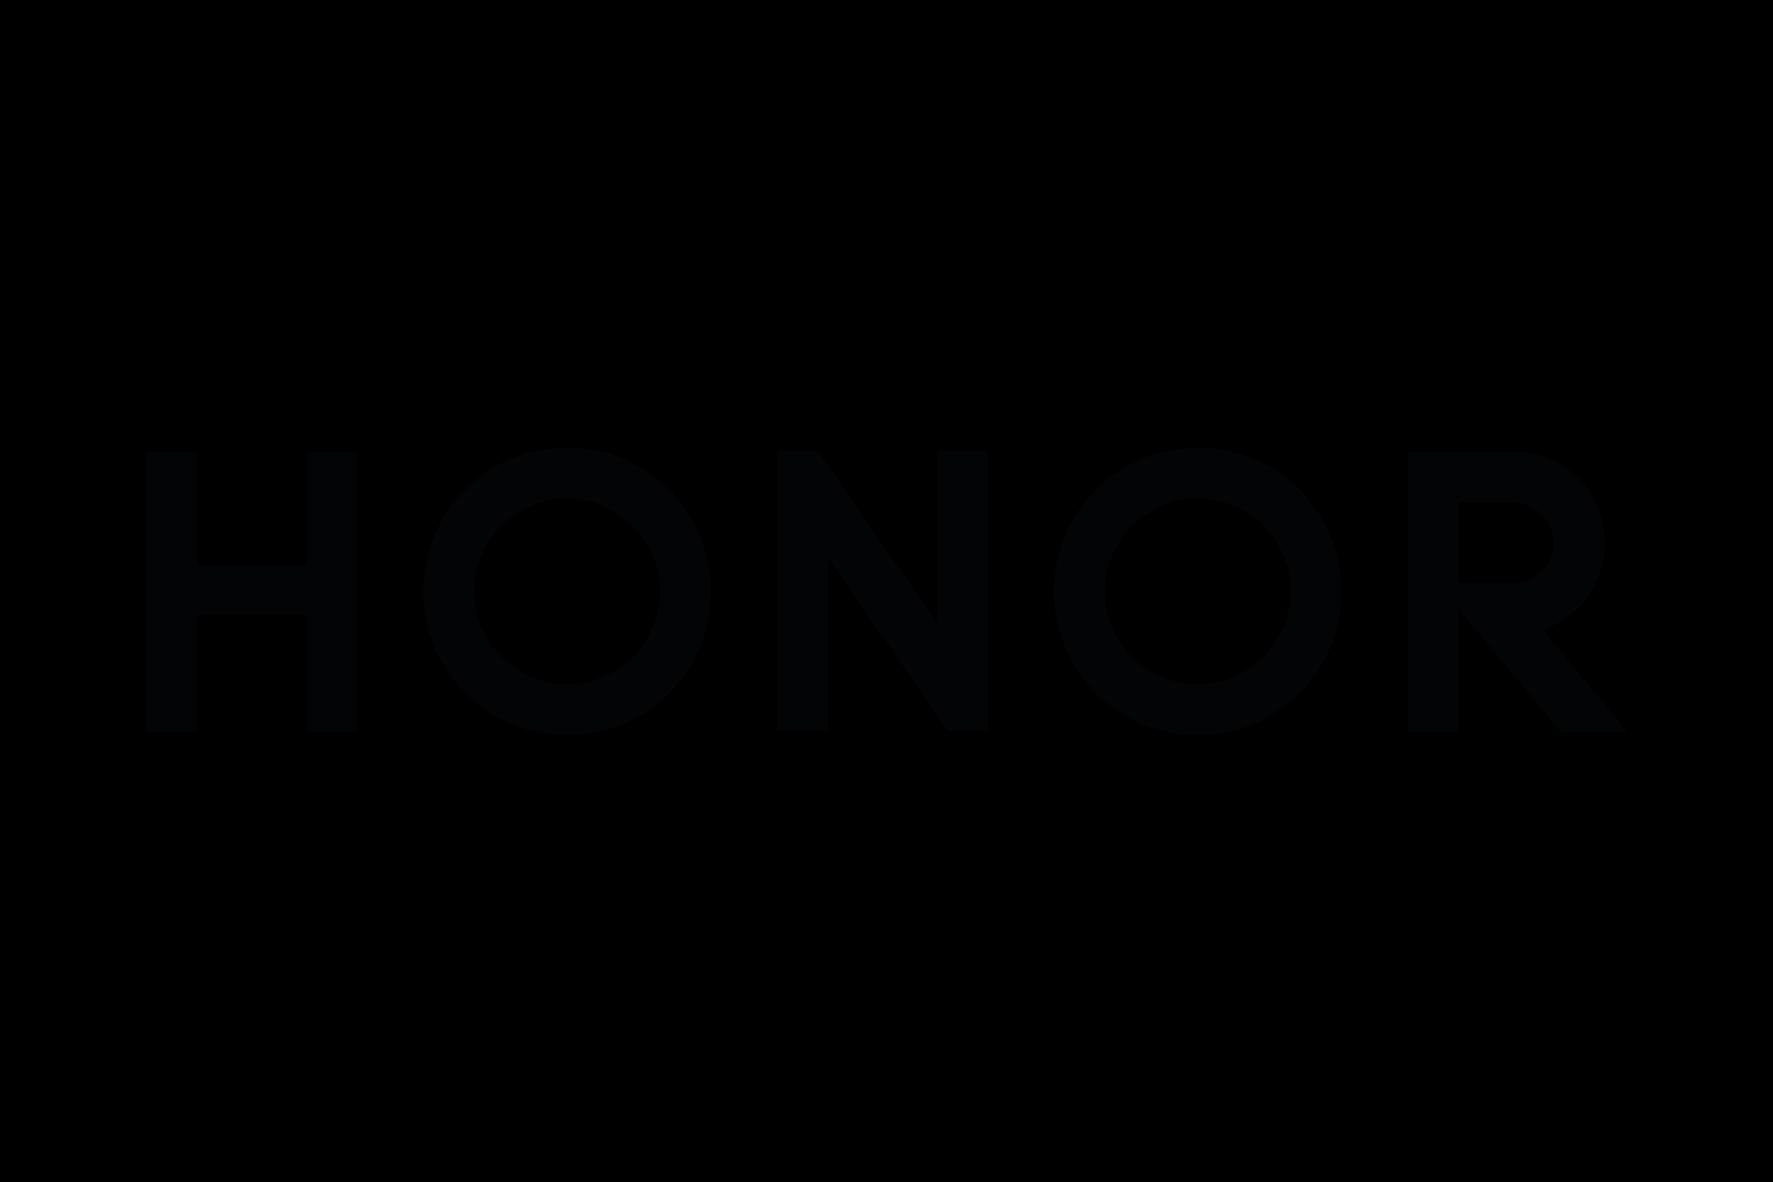 LFM group logo honor